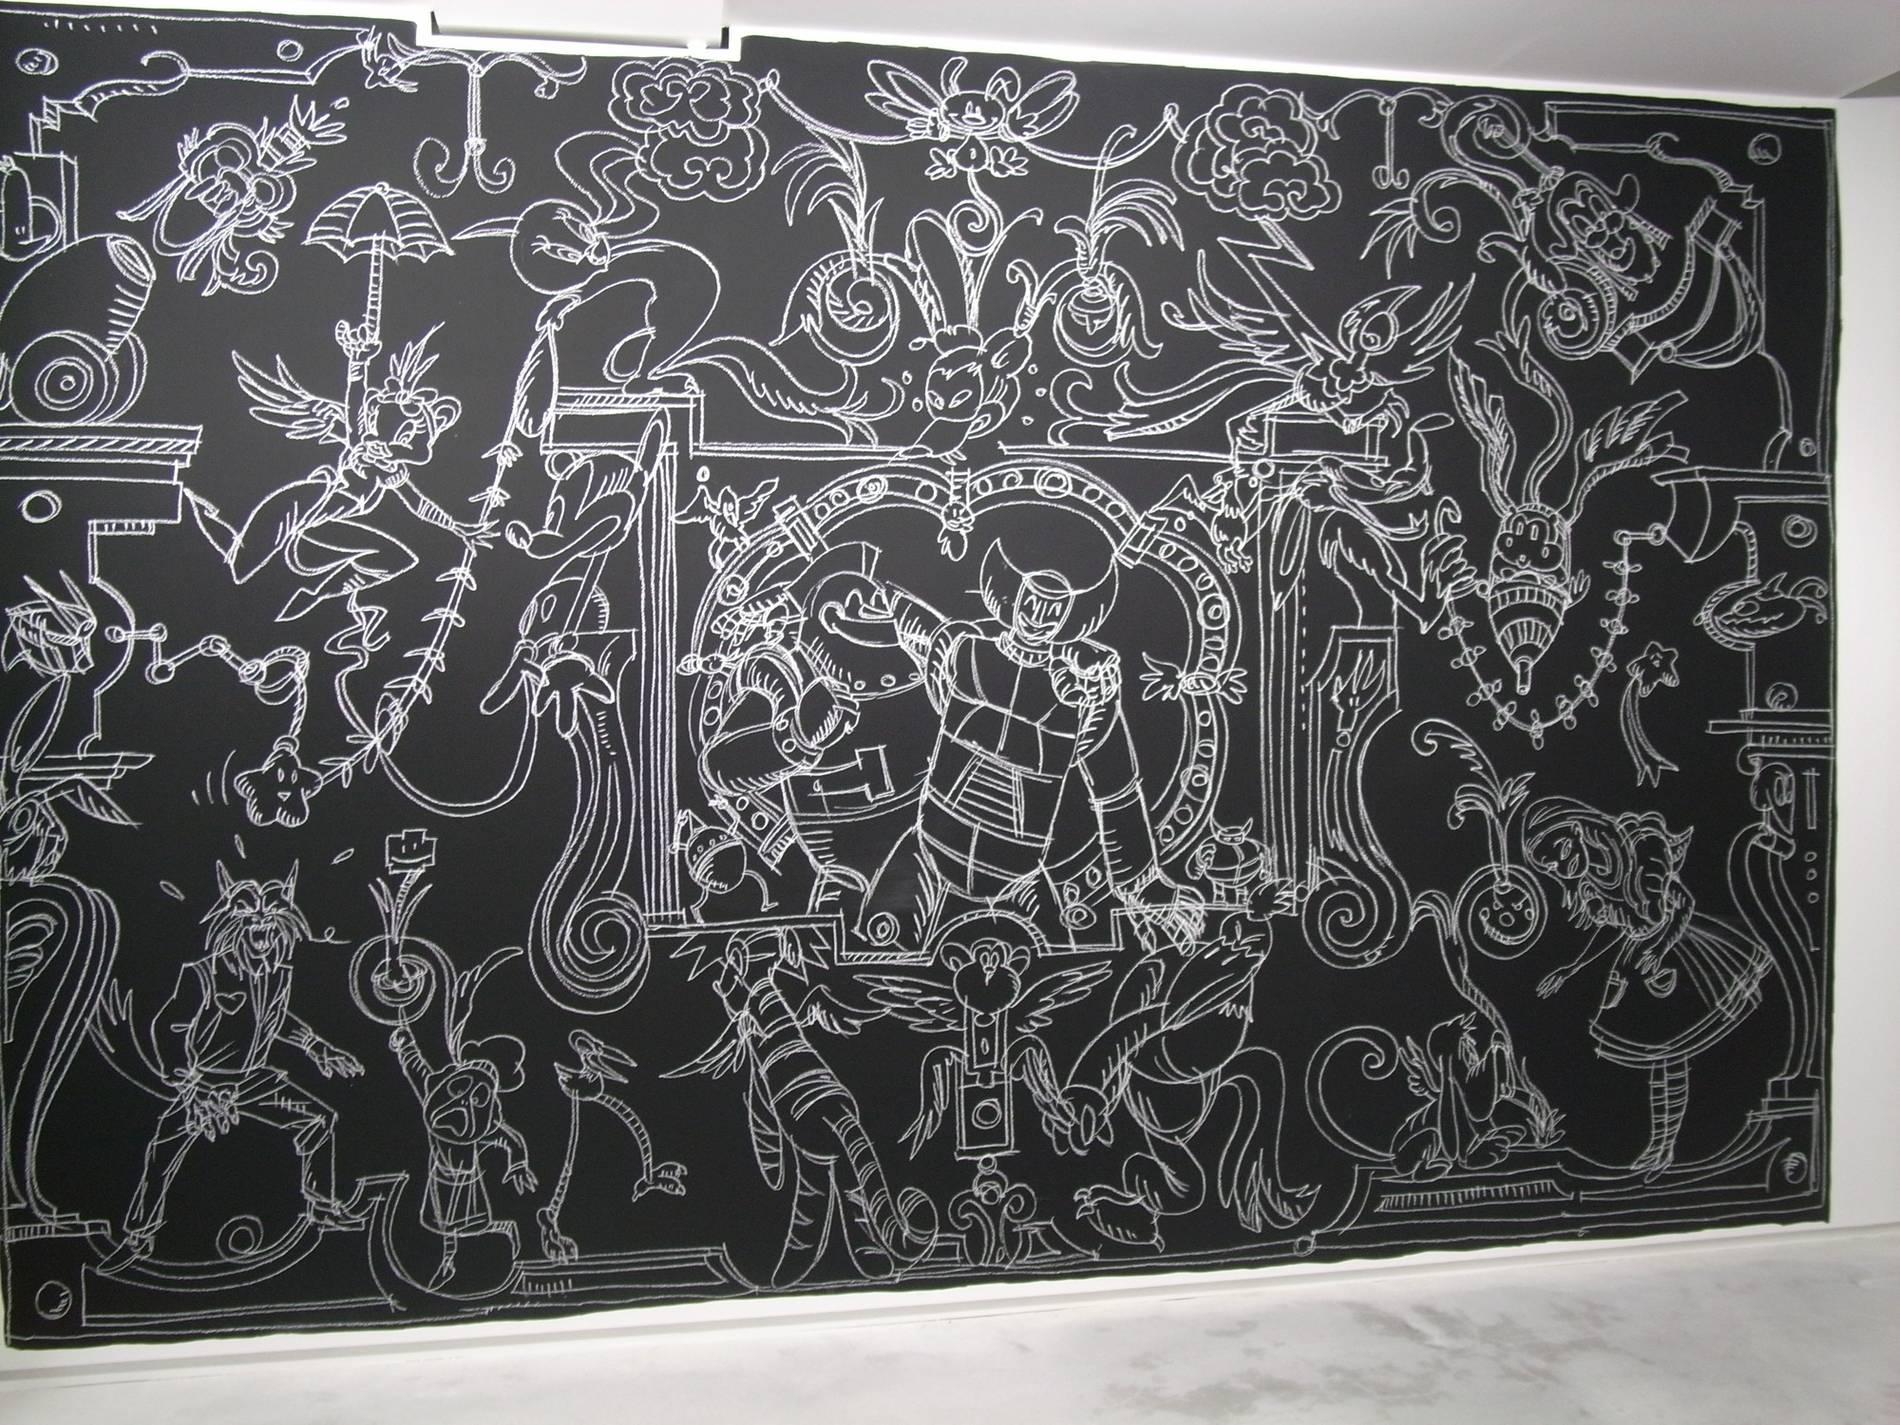 ·: Nicolas Buffe :· - Nicolas-Buffe-2010-01-La-Tour-Megumi-Ogita-Gallery-6-wall-drawing-chalk-paint